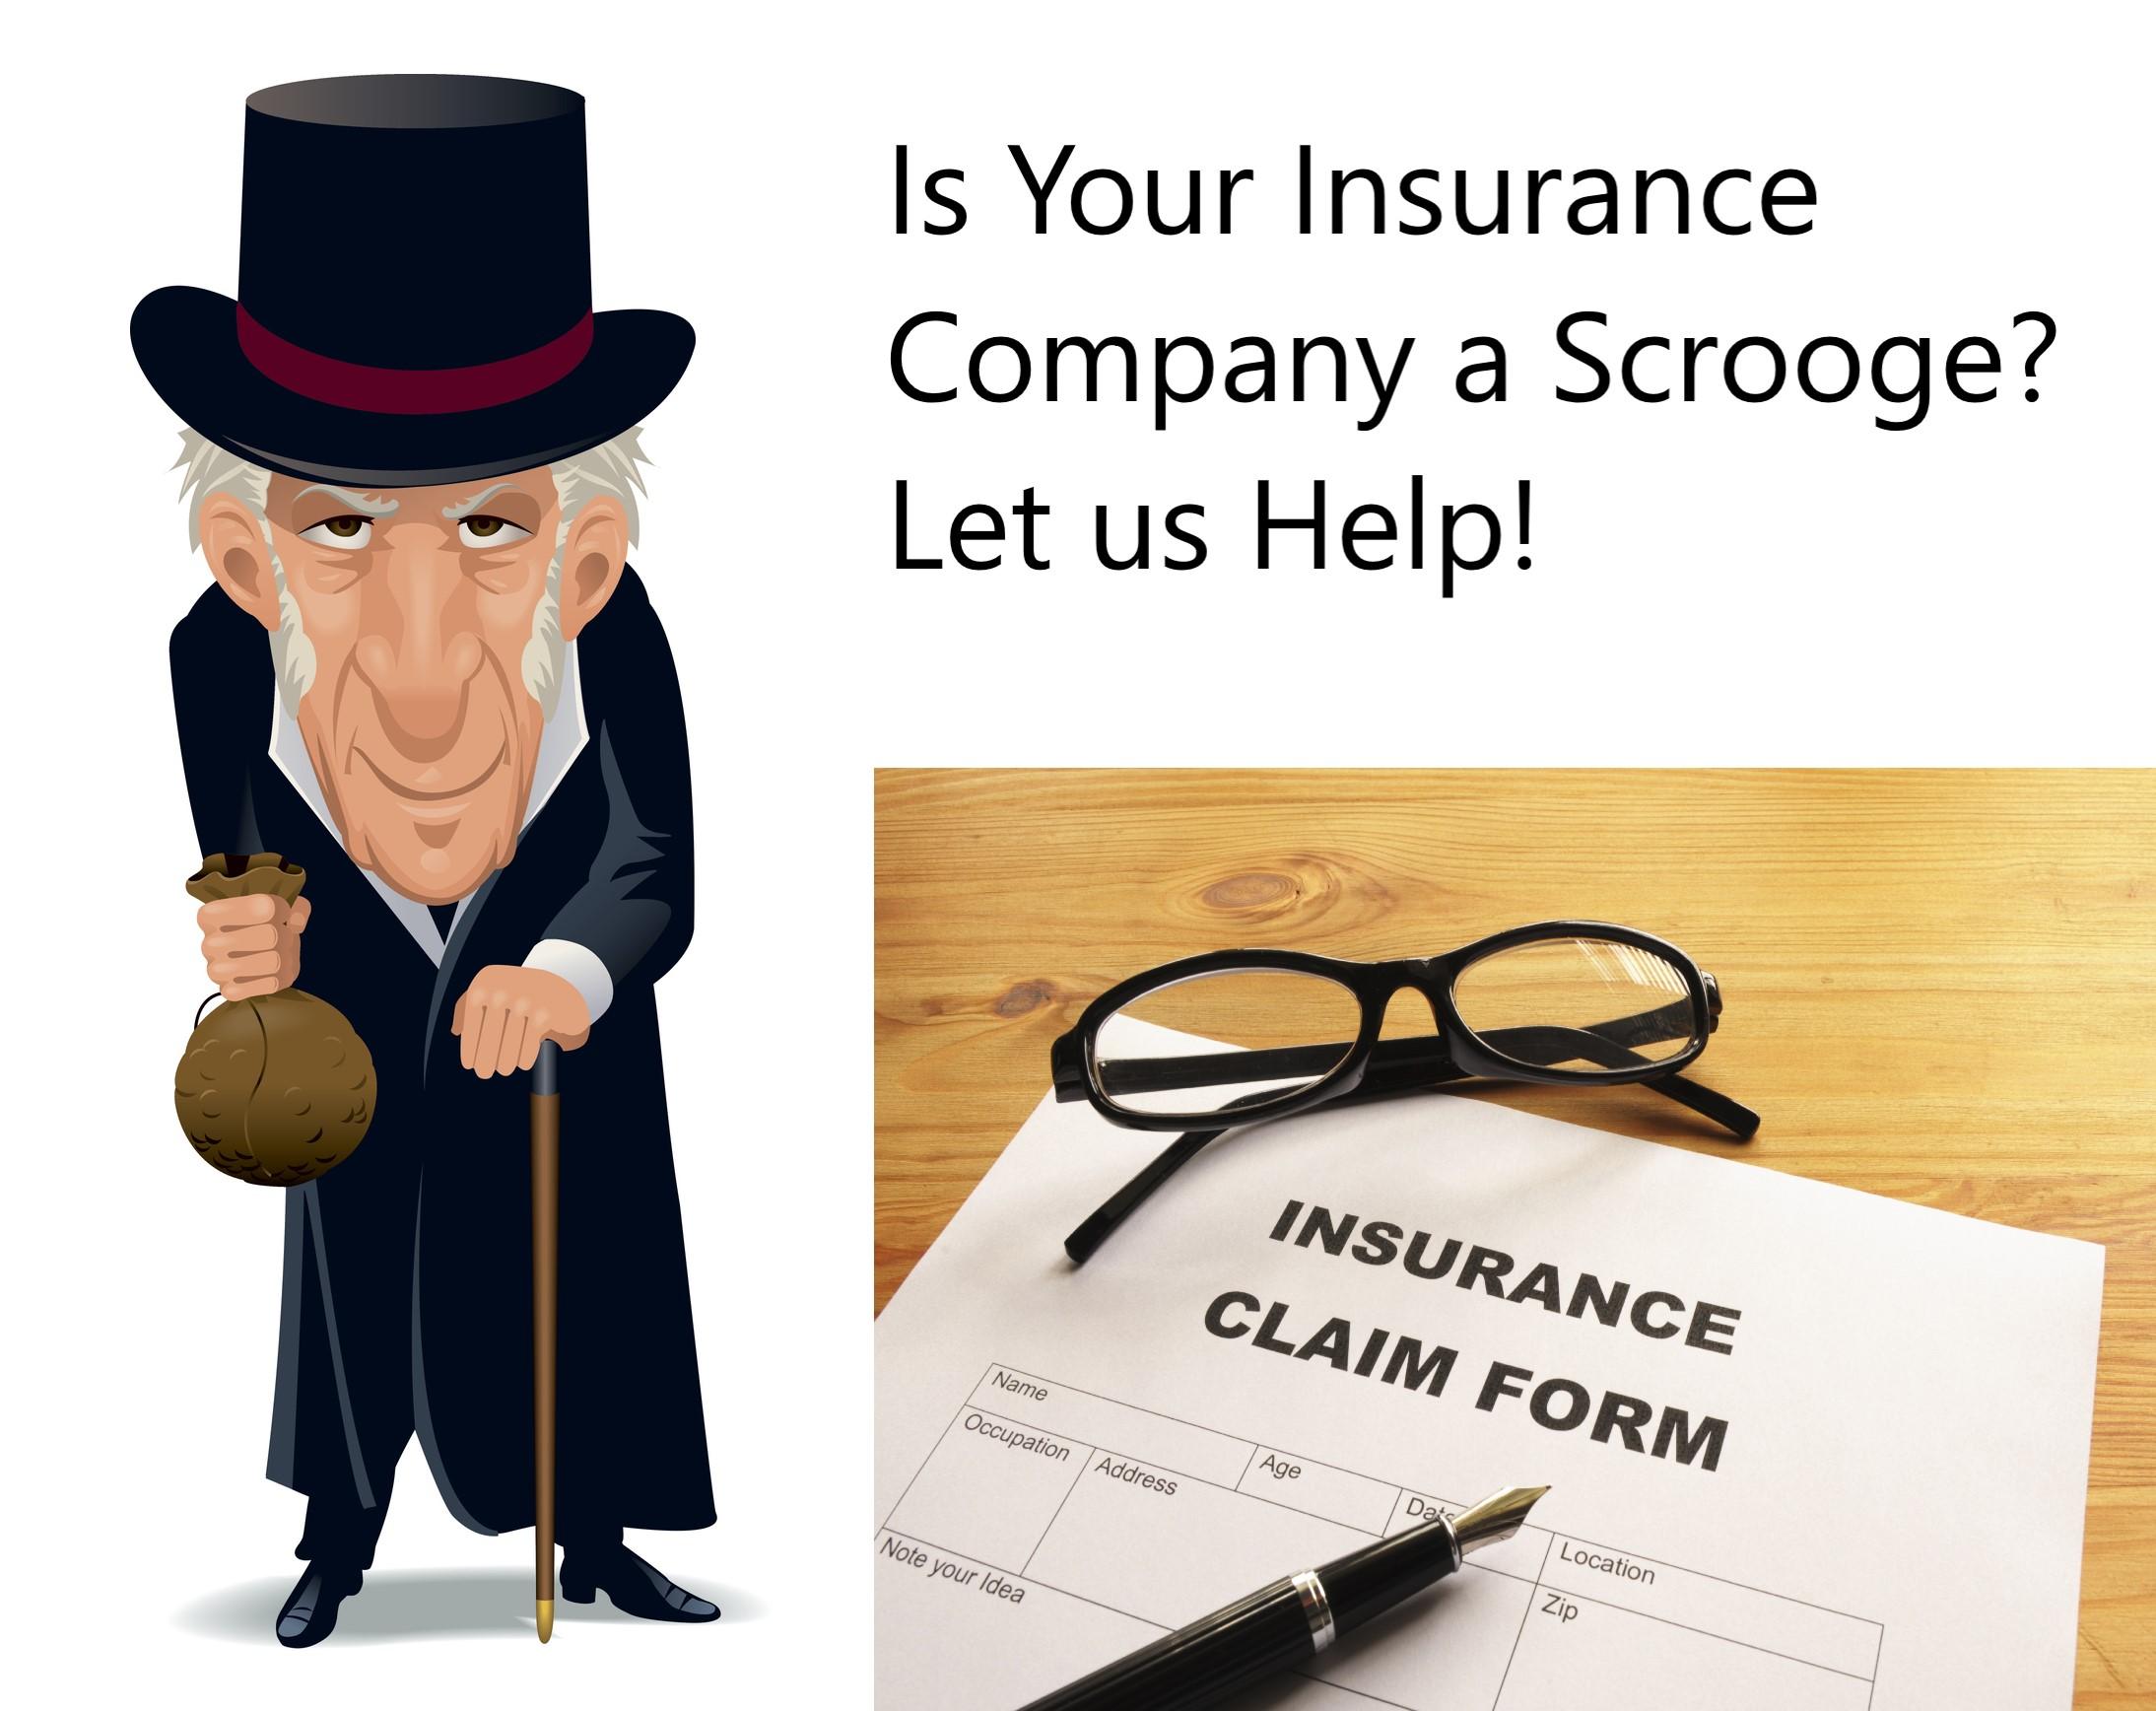 Insurance Company Scrooge.jpg